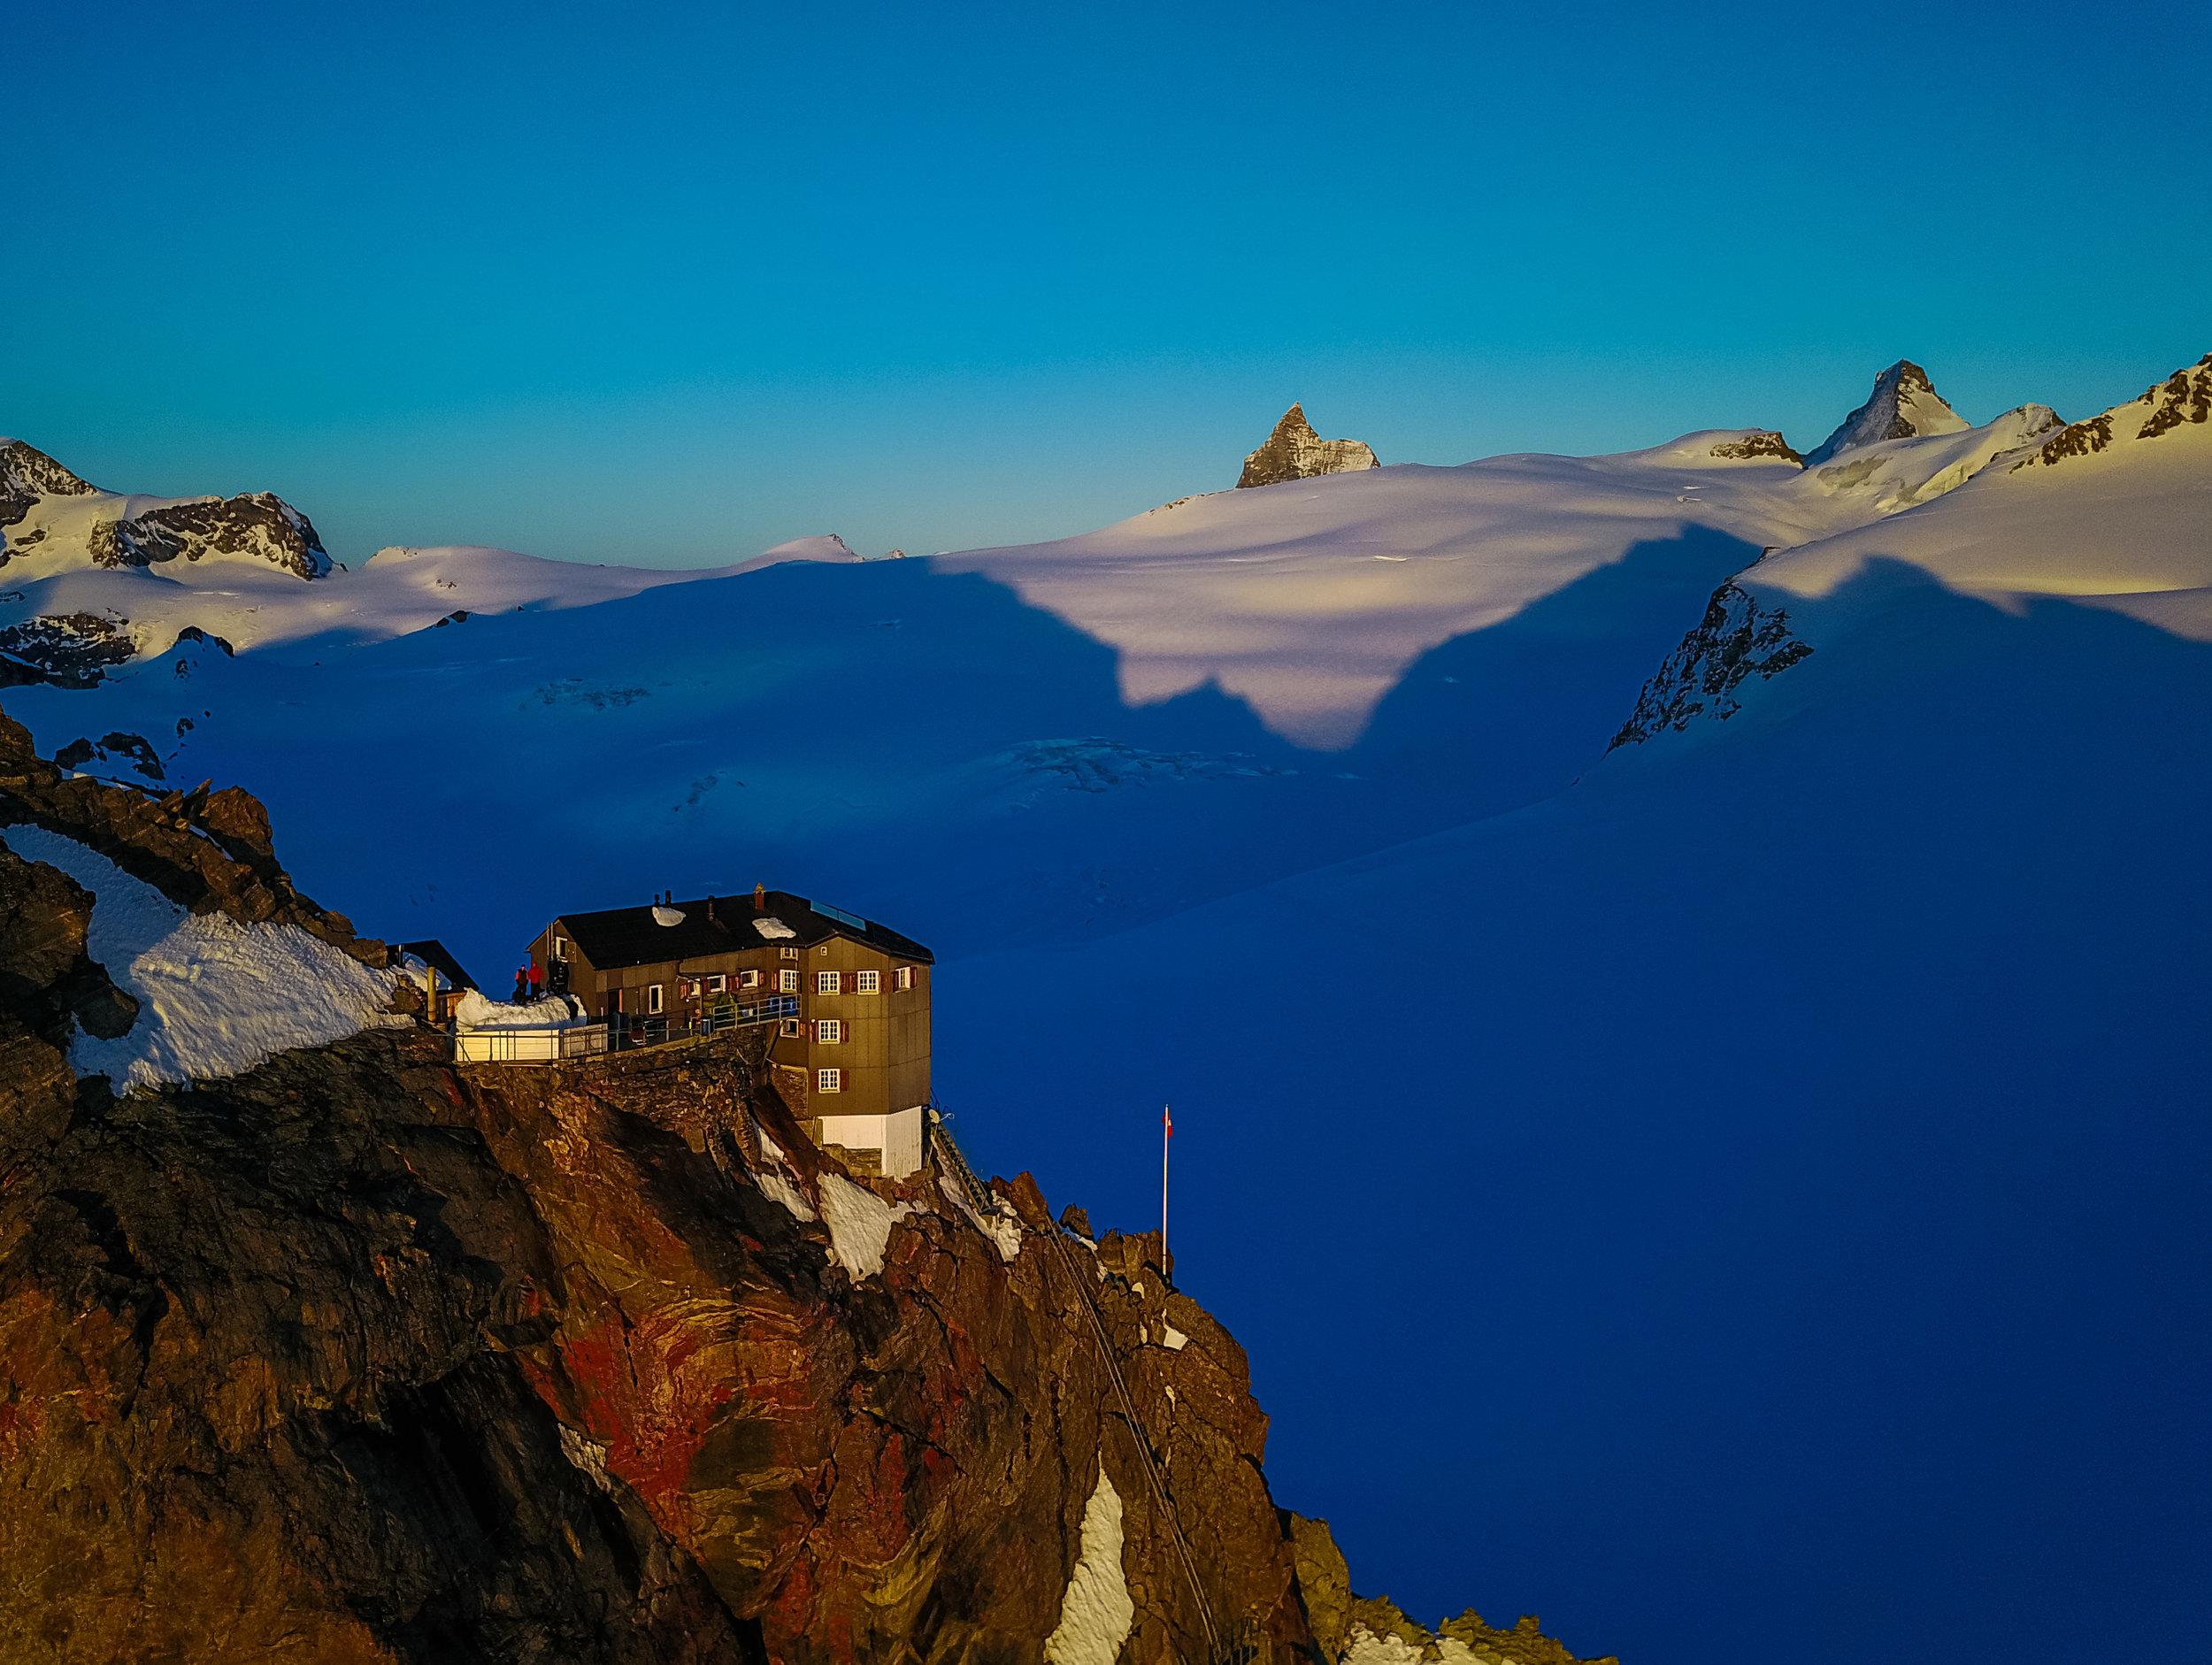 Alpenglow on the Bertol Hut